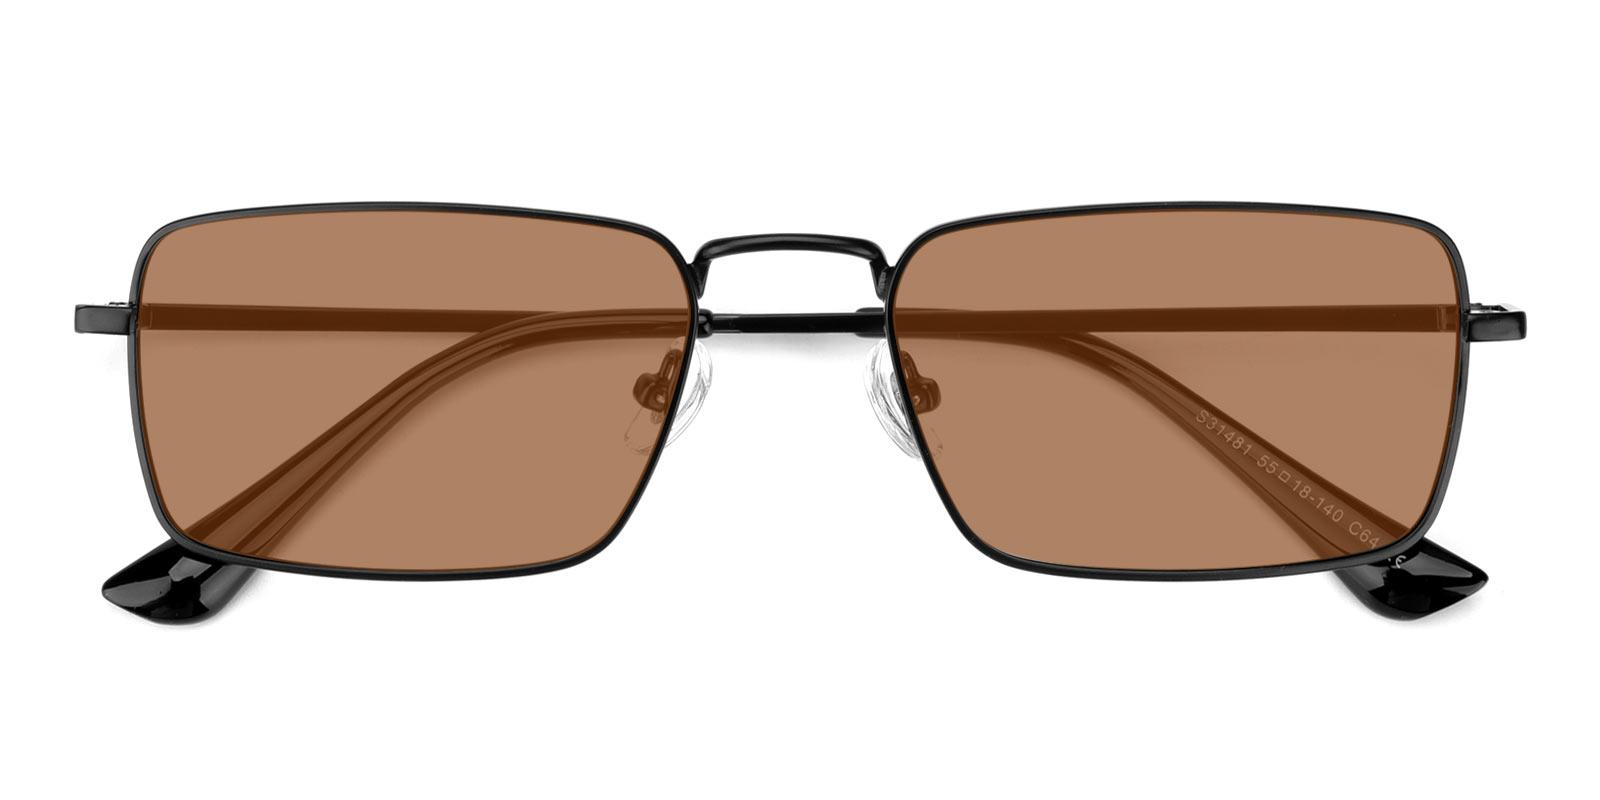 Phoebe-Brown-Rectangle-Metal-Sunglasses-detail